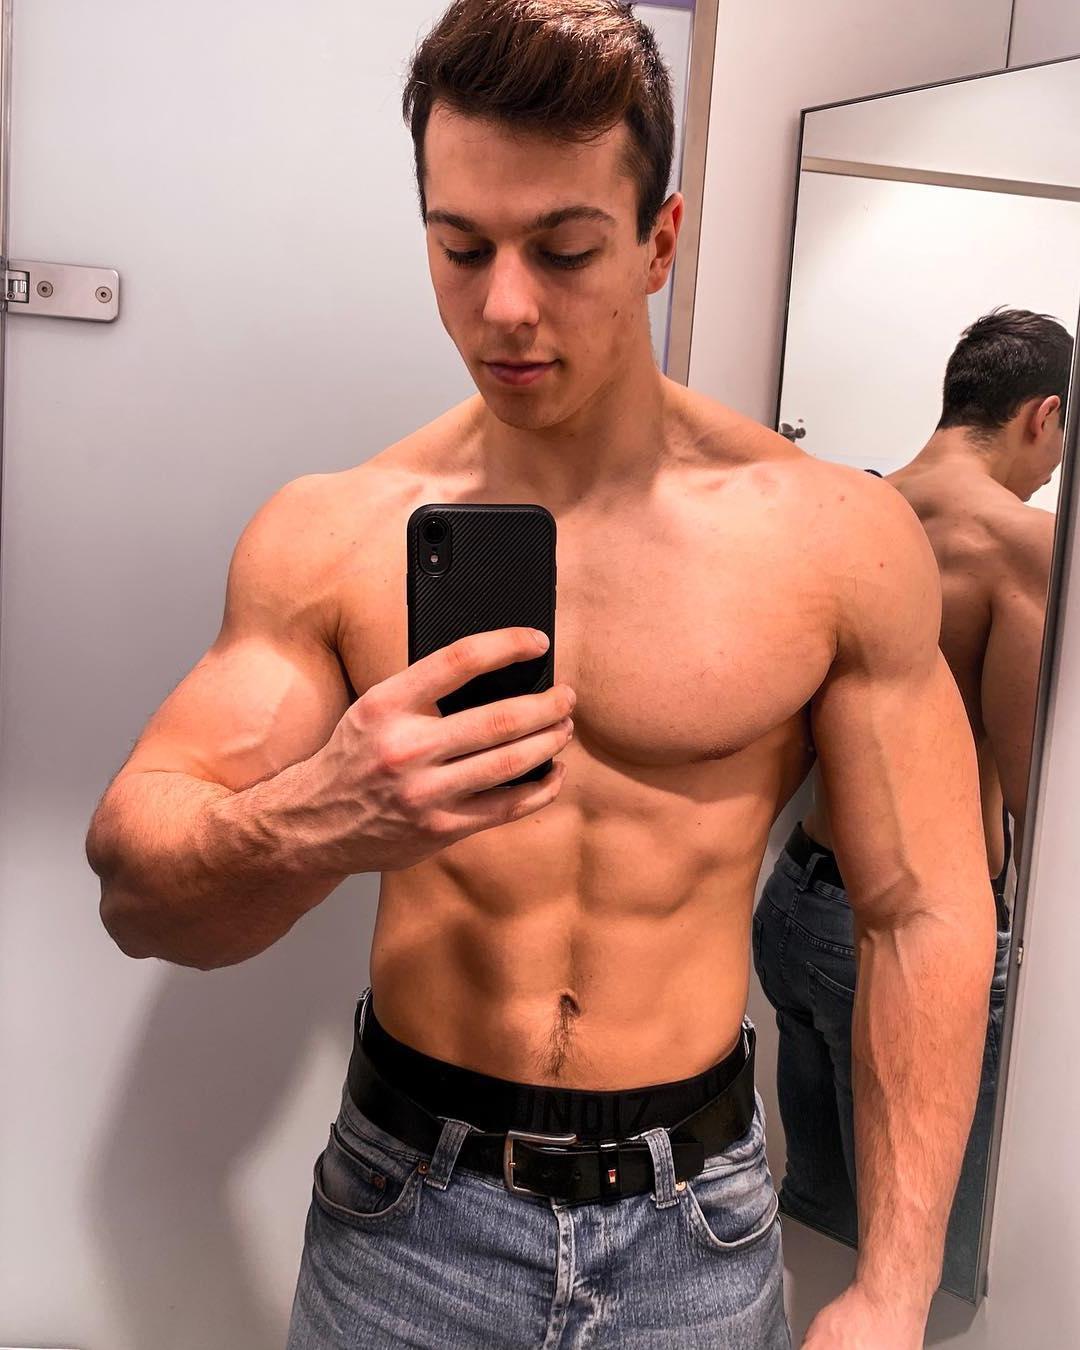 strong-barechest-hunk-paul-unterleitner-jeans-mirror-selfie